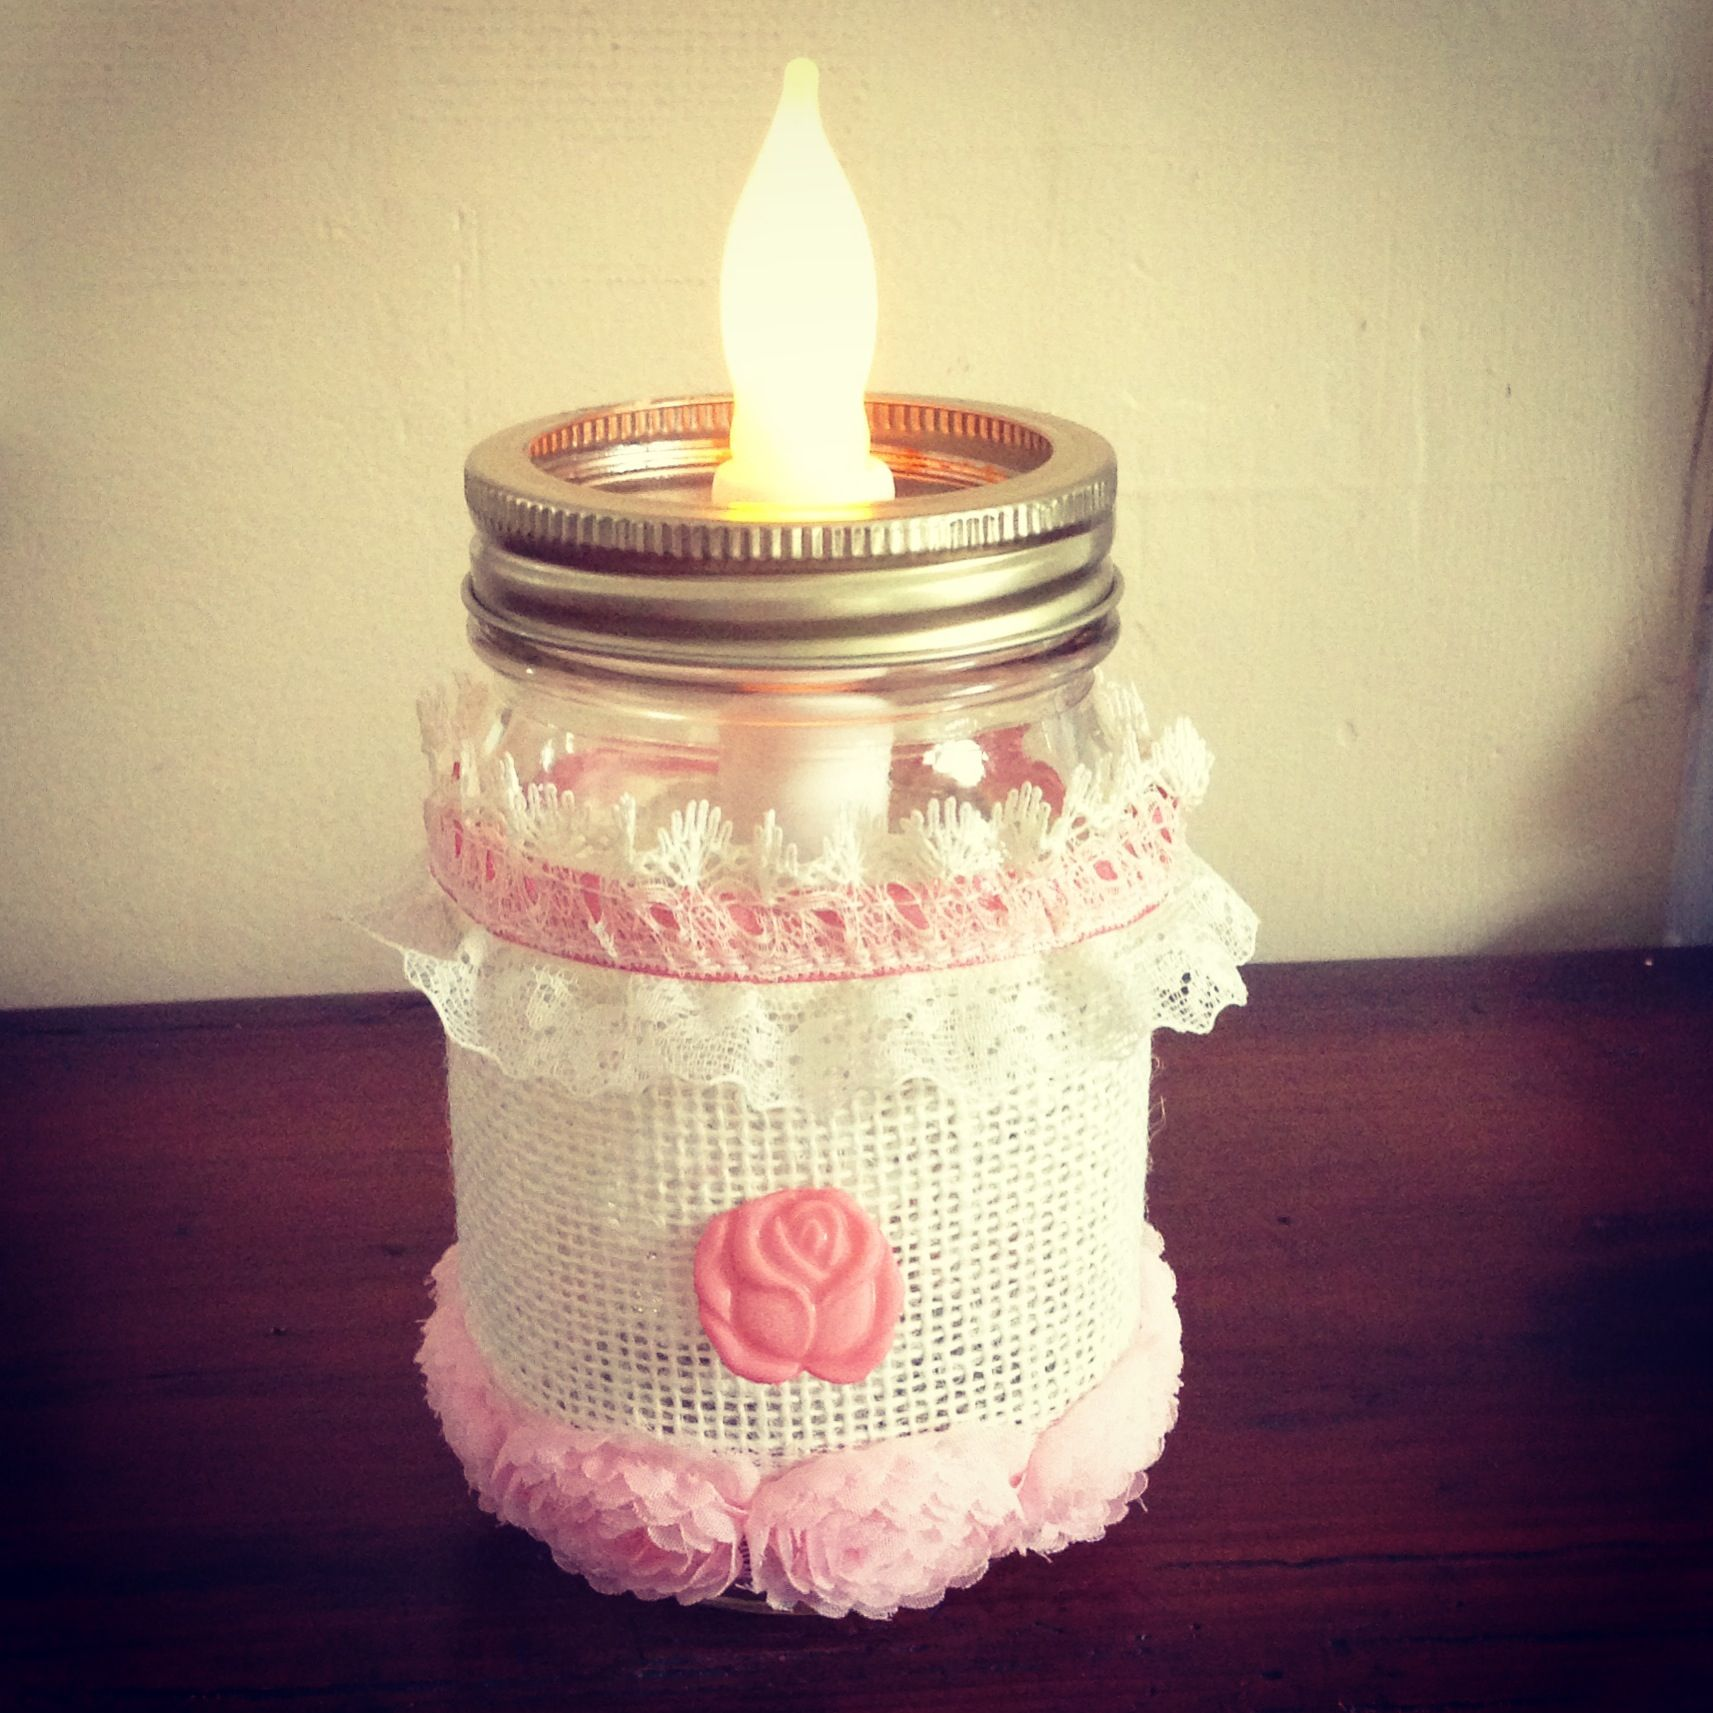 Mason jar centerpiece for birthday or baby